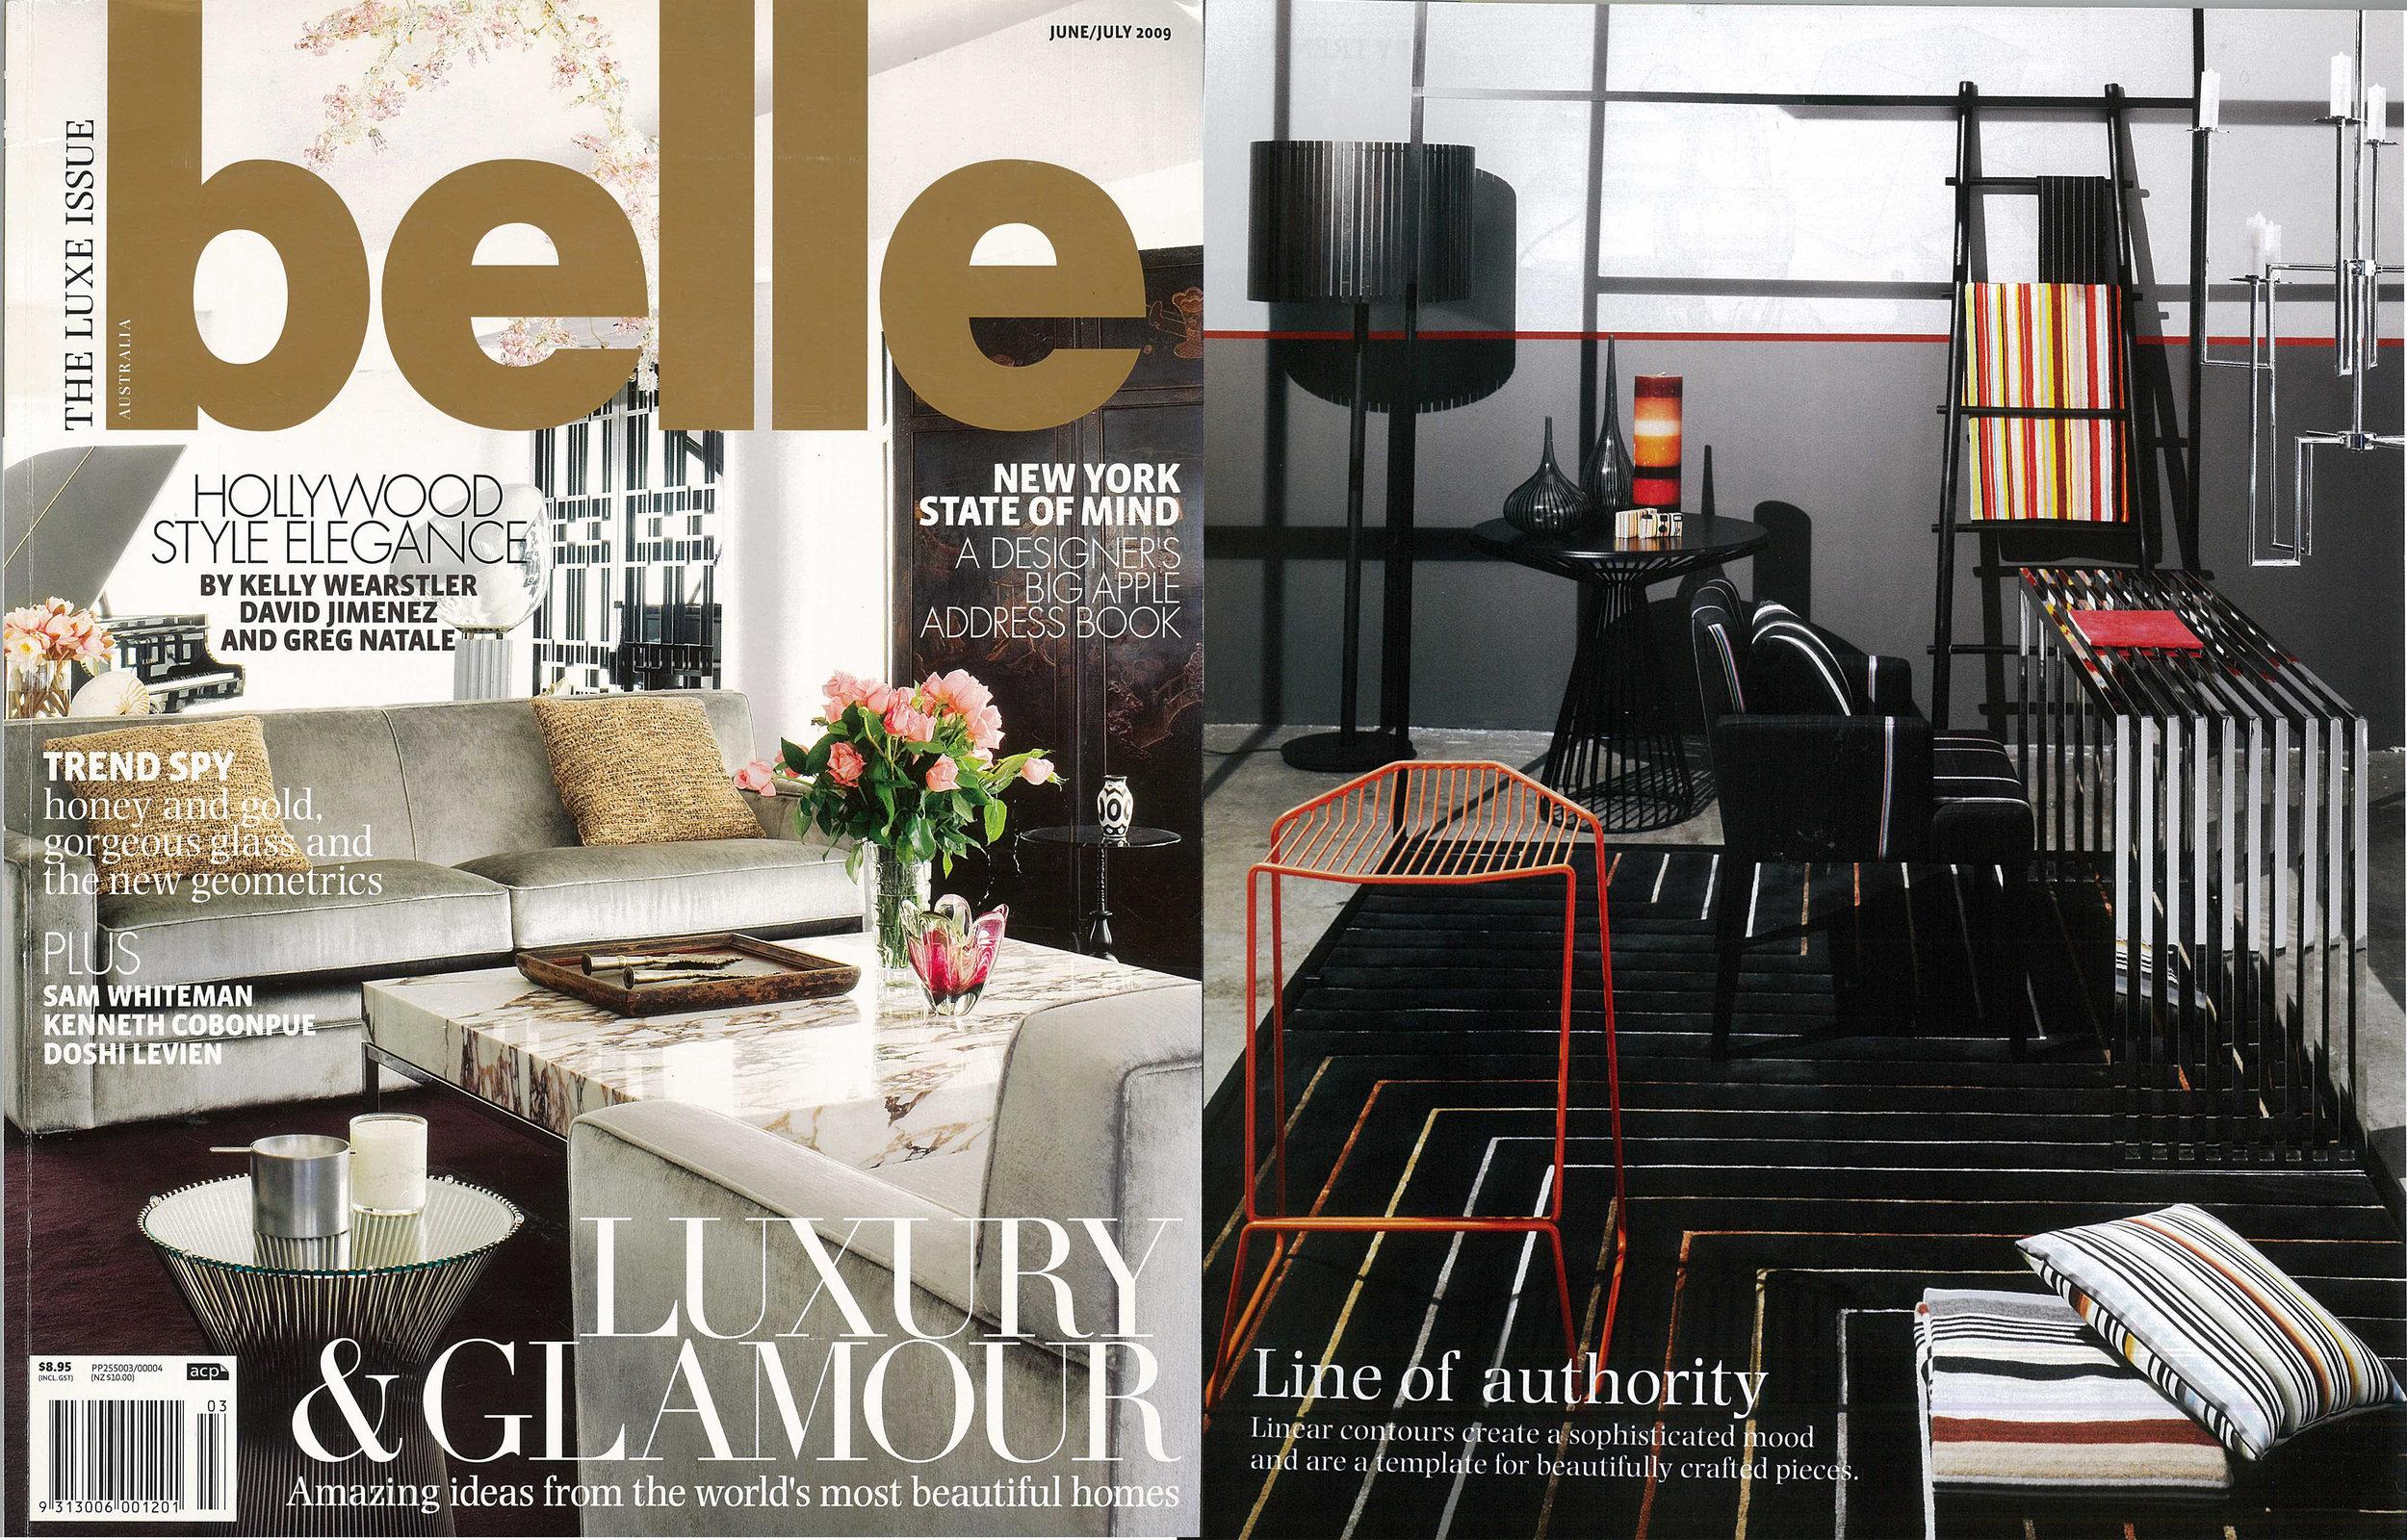 Belle Magazine - Jun/Jul 2009